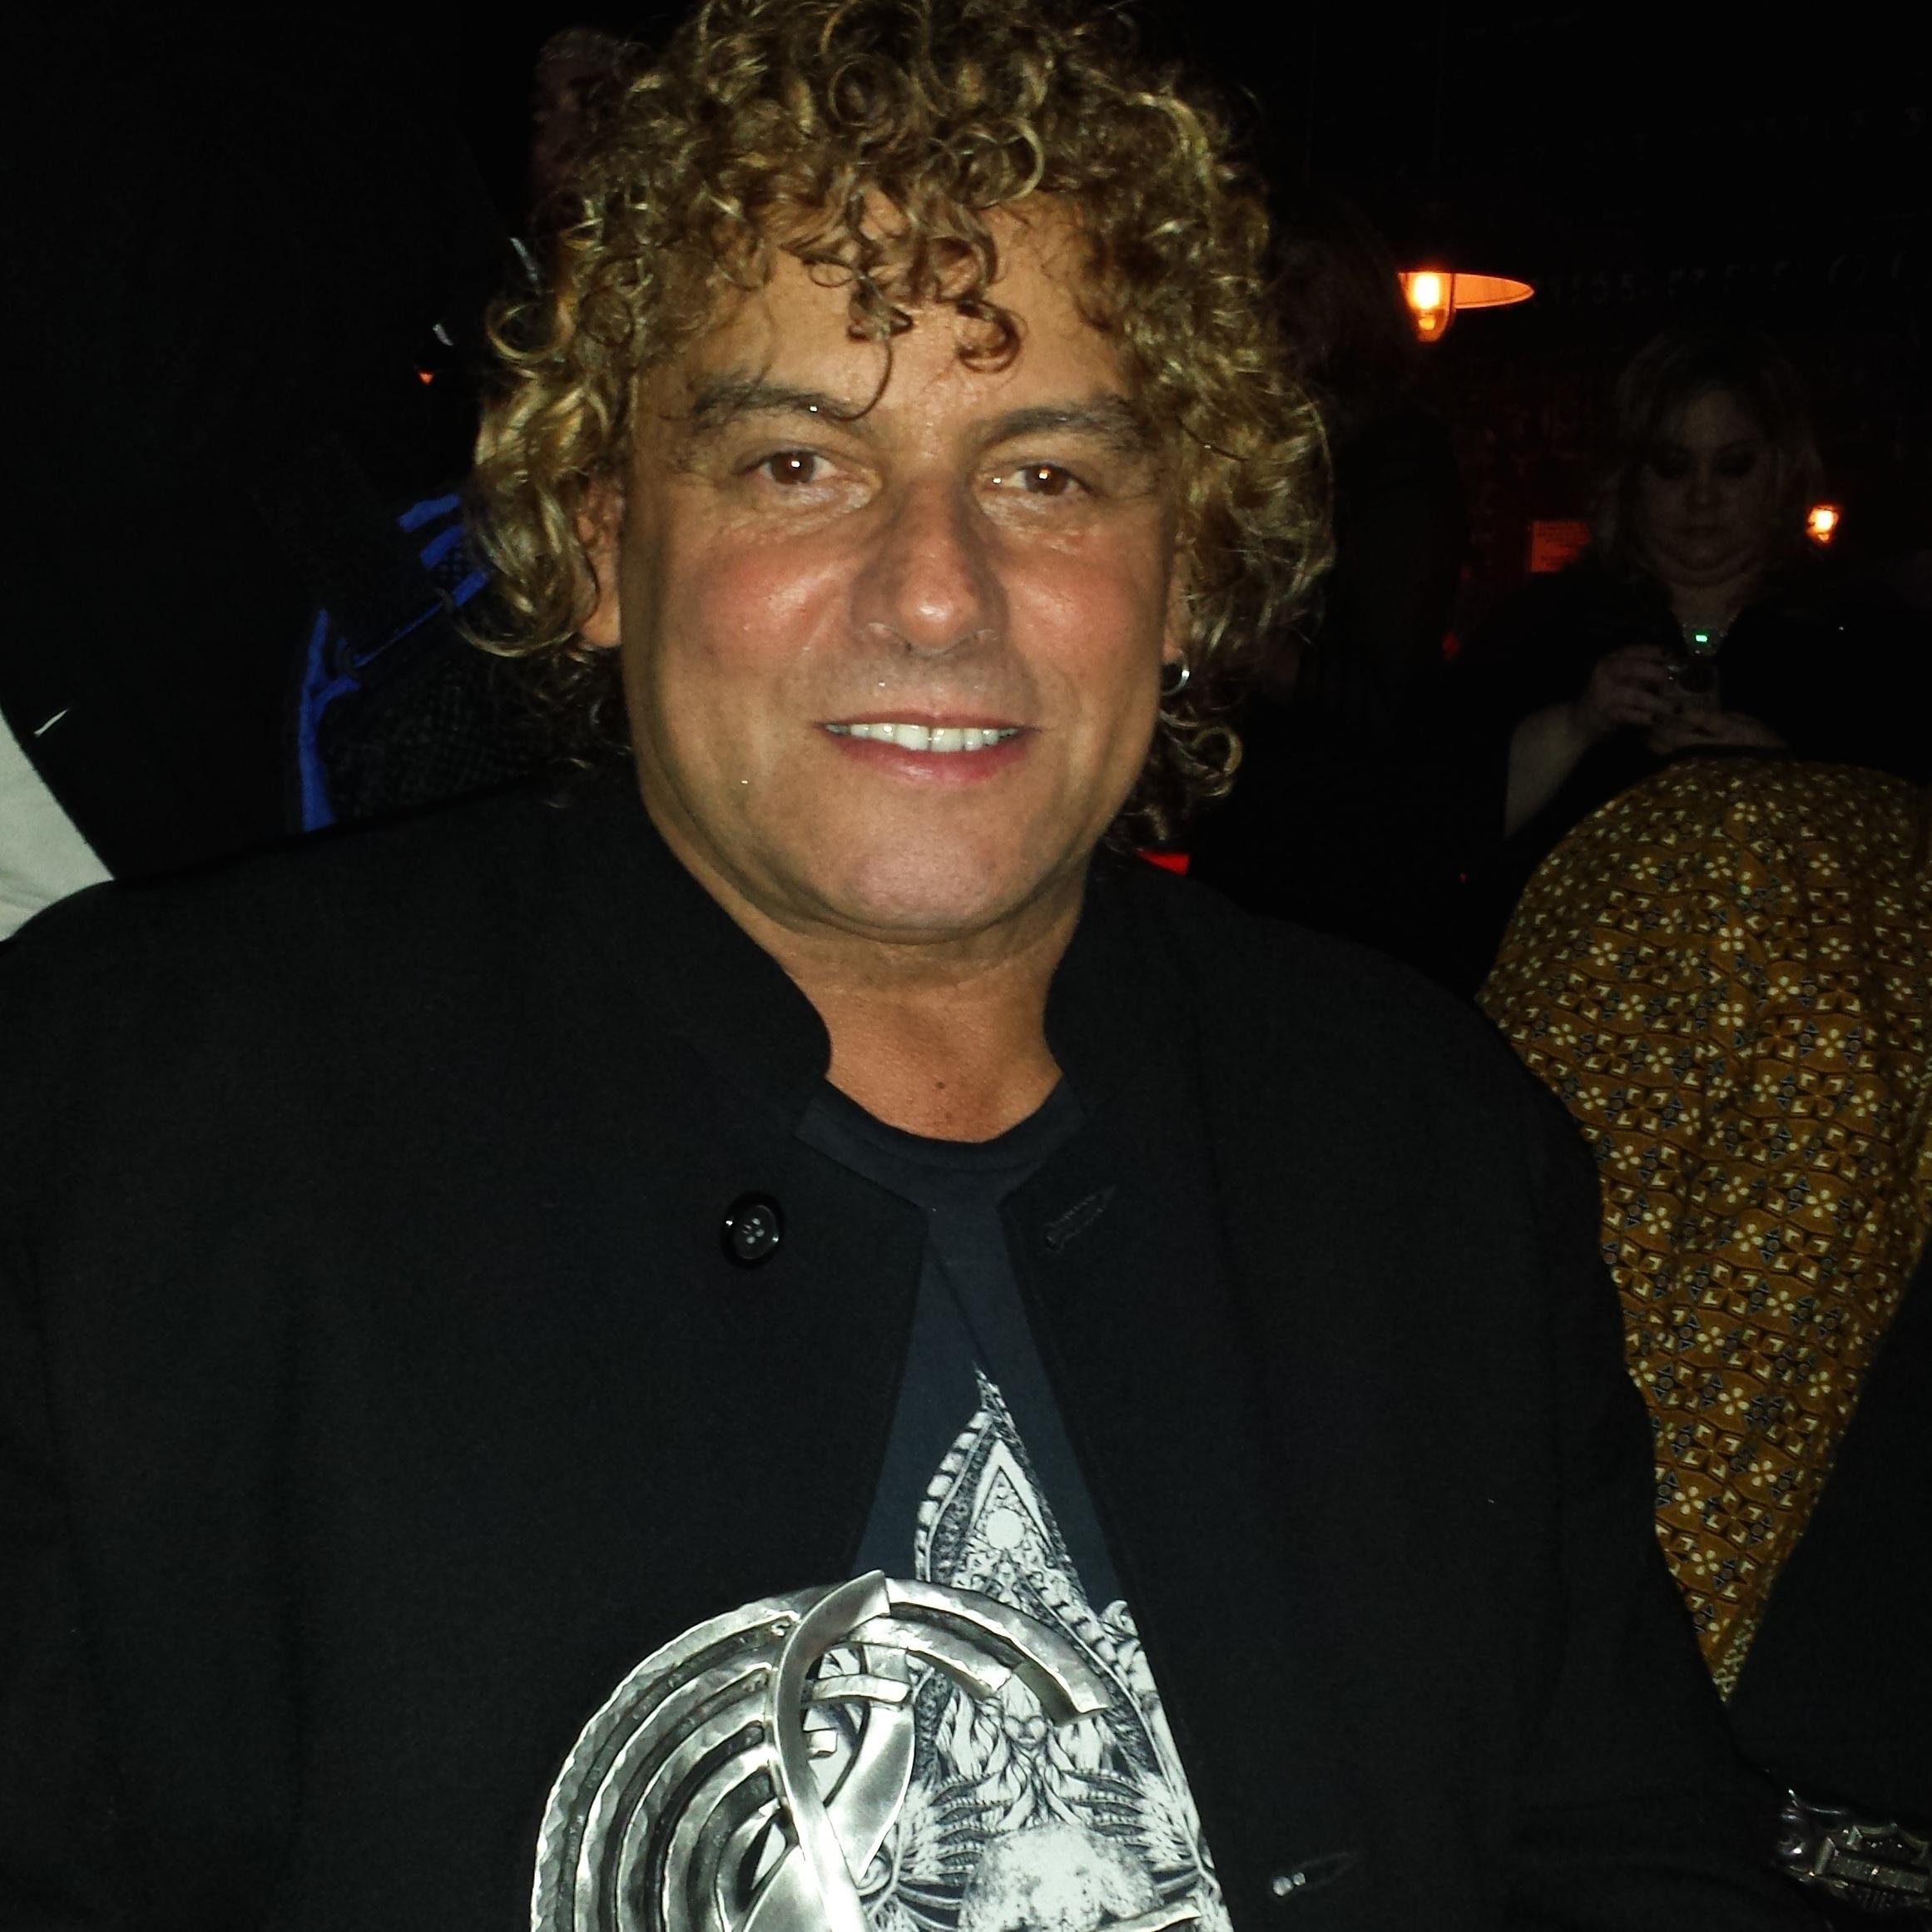 Long Island Music Hall of Fame award.